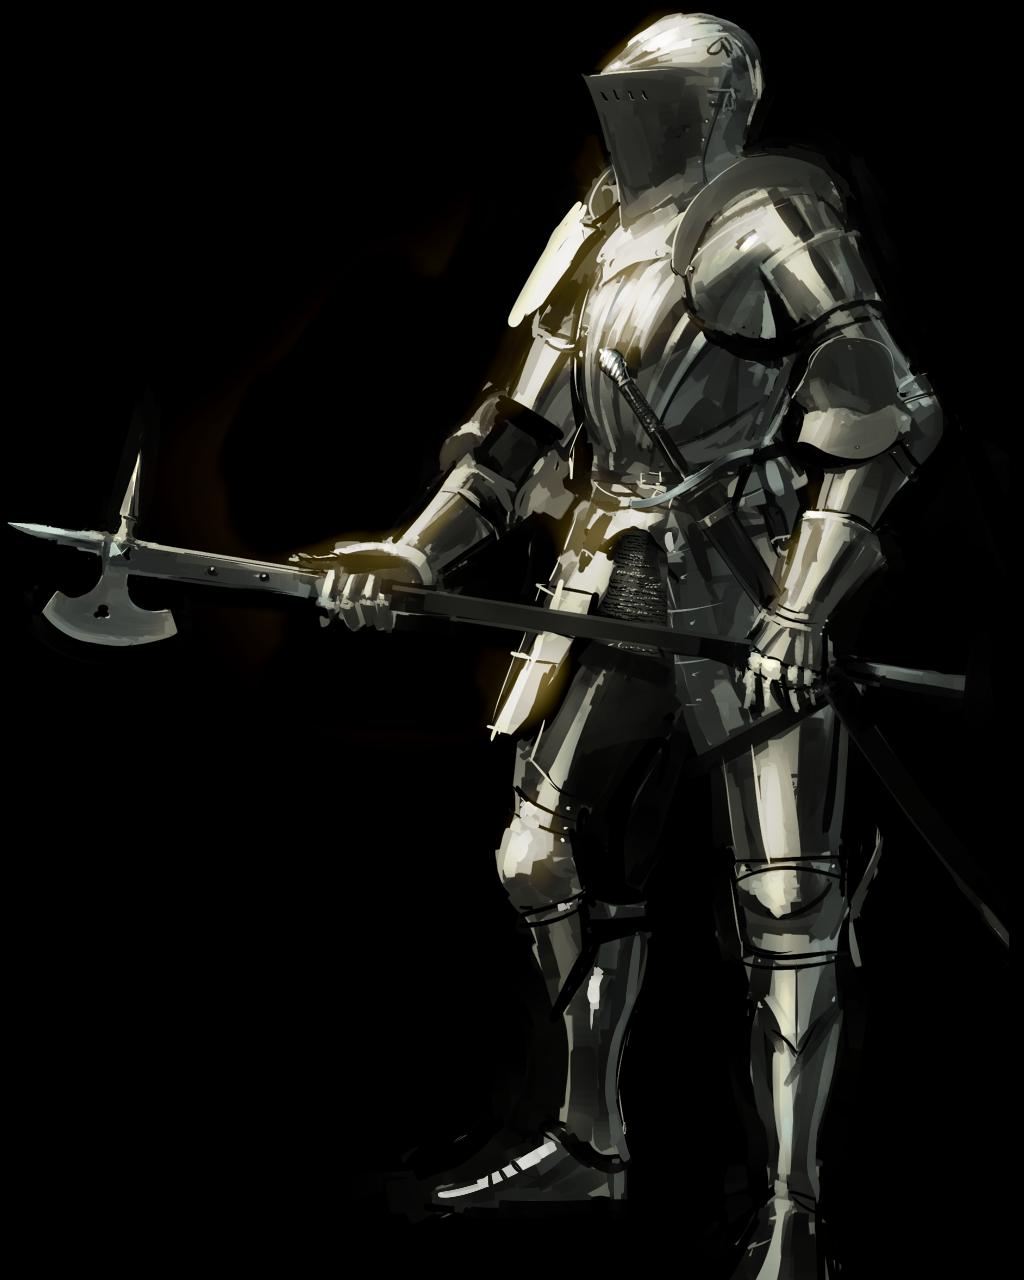 Tumblr Oe59ed57qt1ukywavo1 1280 Png 1024 1280 Cartoon Knight Fantasy Art Warrior Fantasy Armor